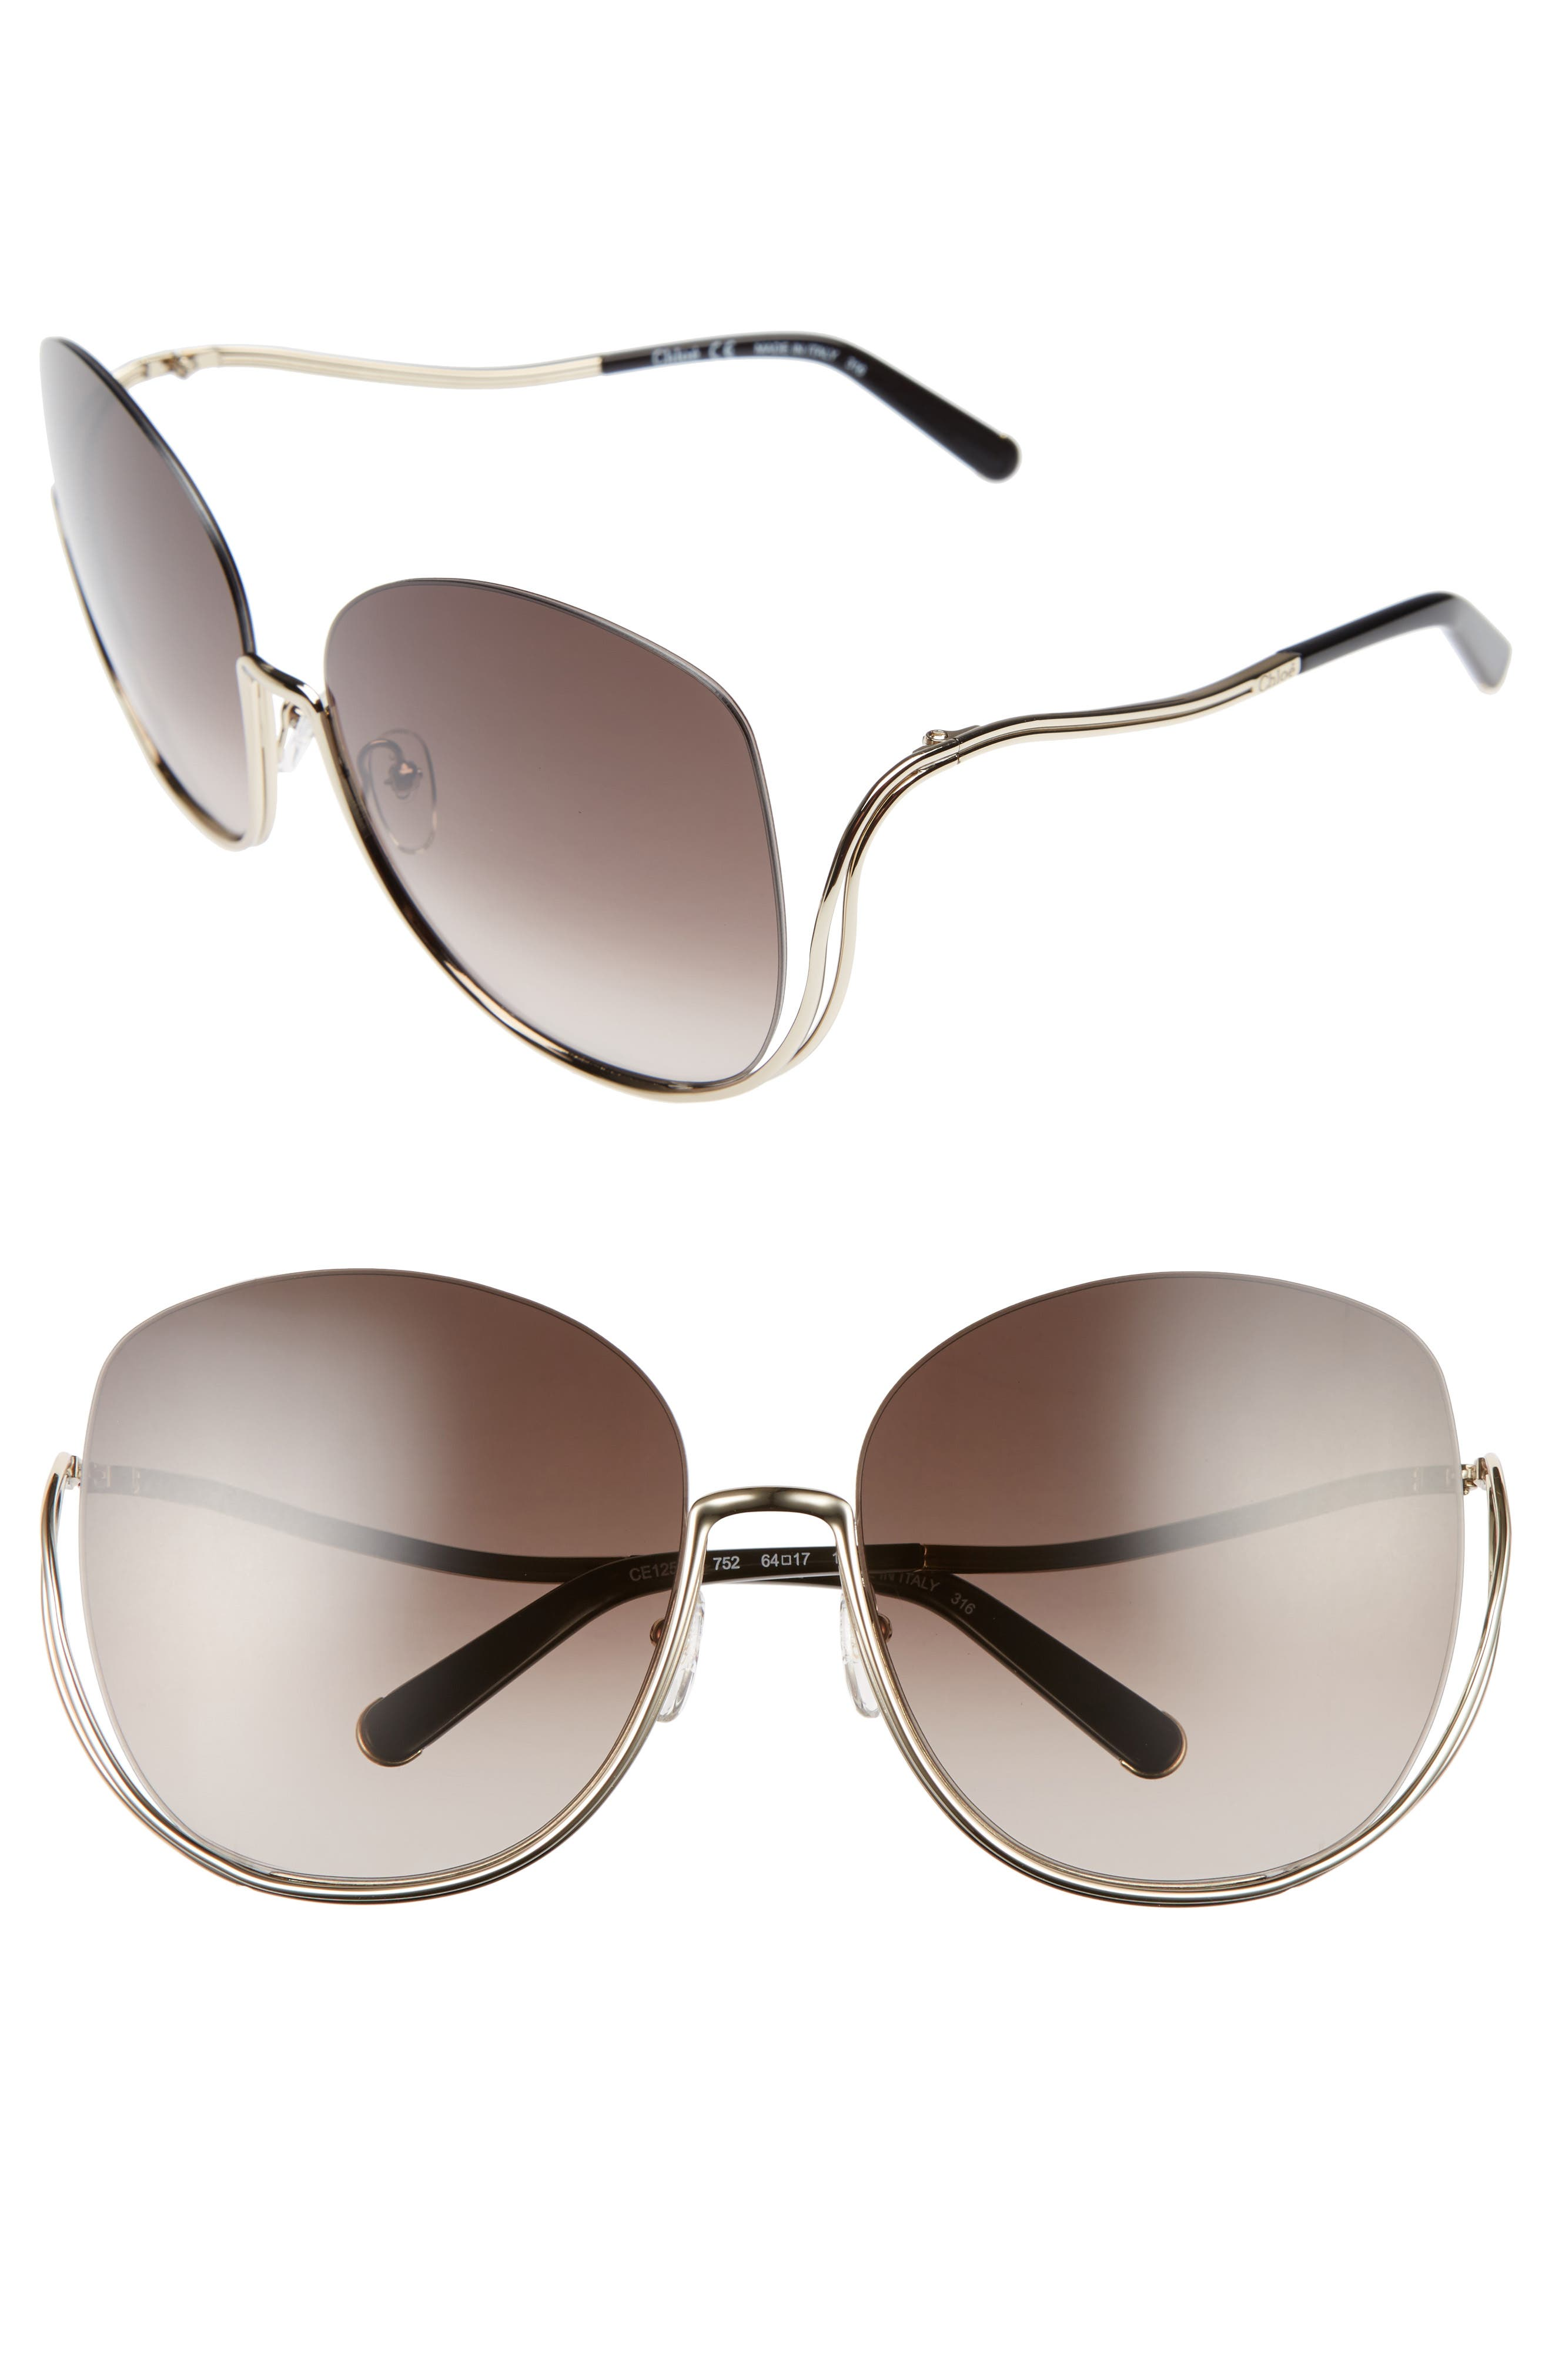 CHLOÉ,                             Milla 64mm Oversize Sunglasses,                             Main thumbnail 1, color,                             710